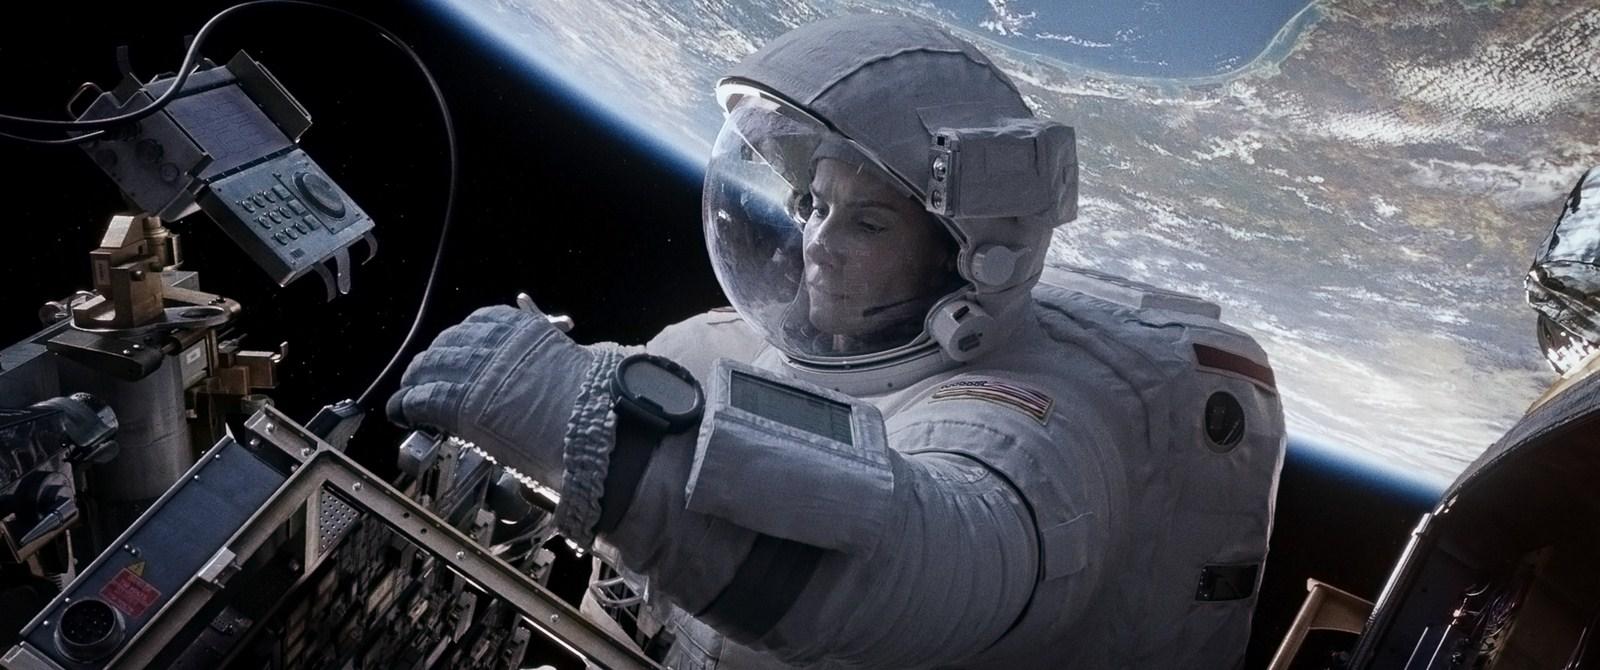 gravity_image-2.jpg